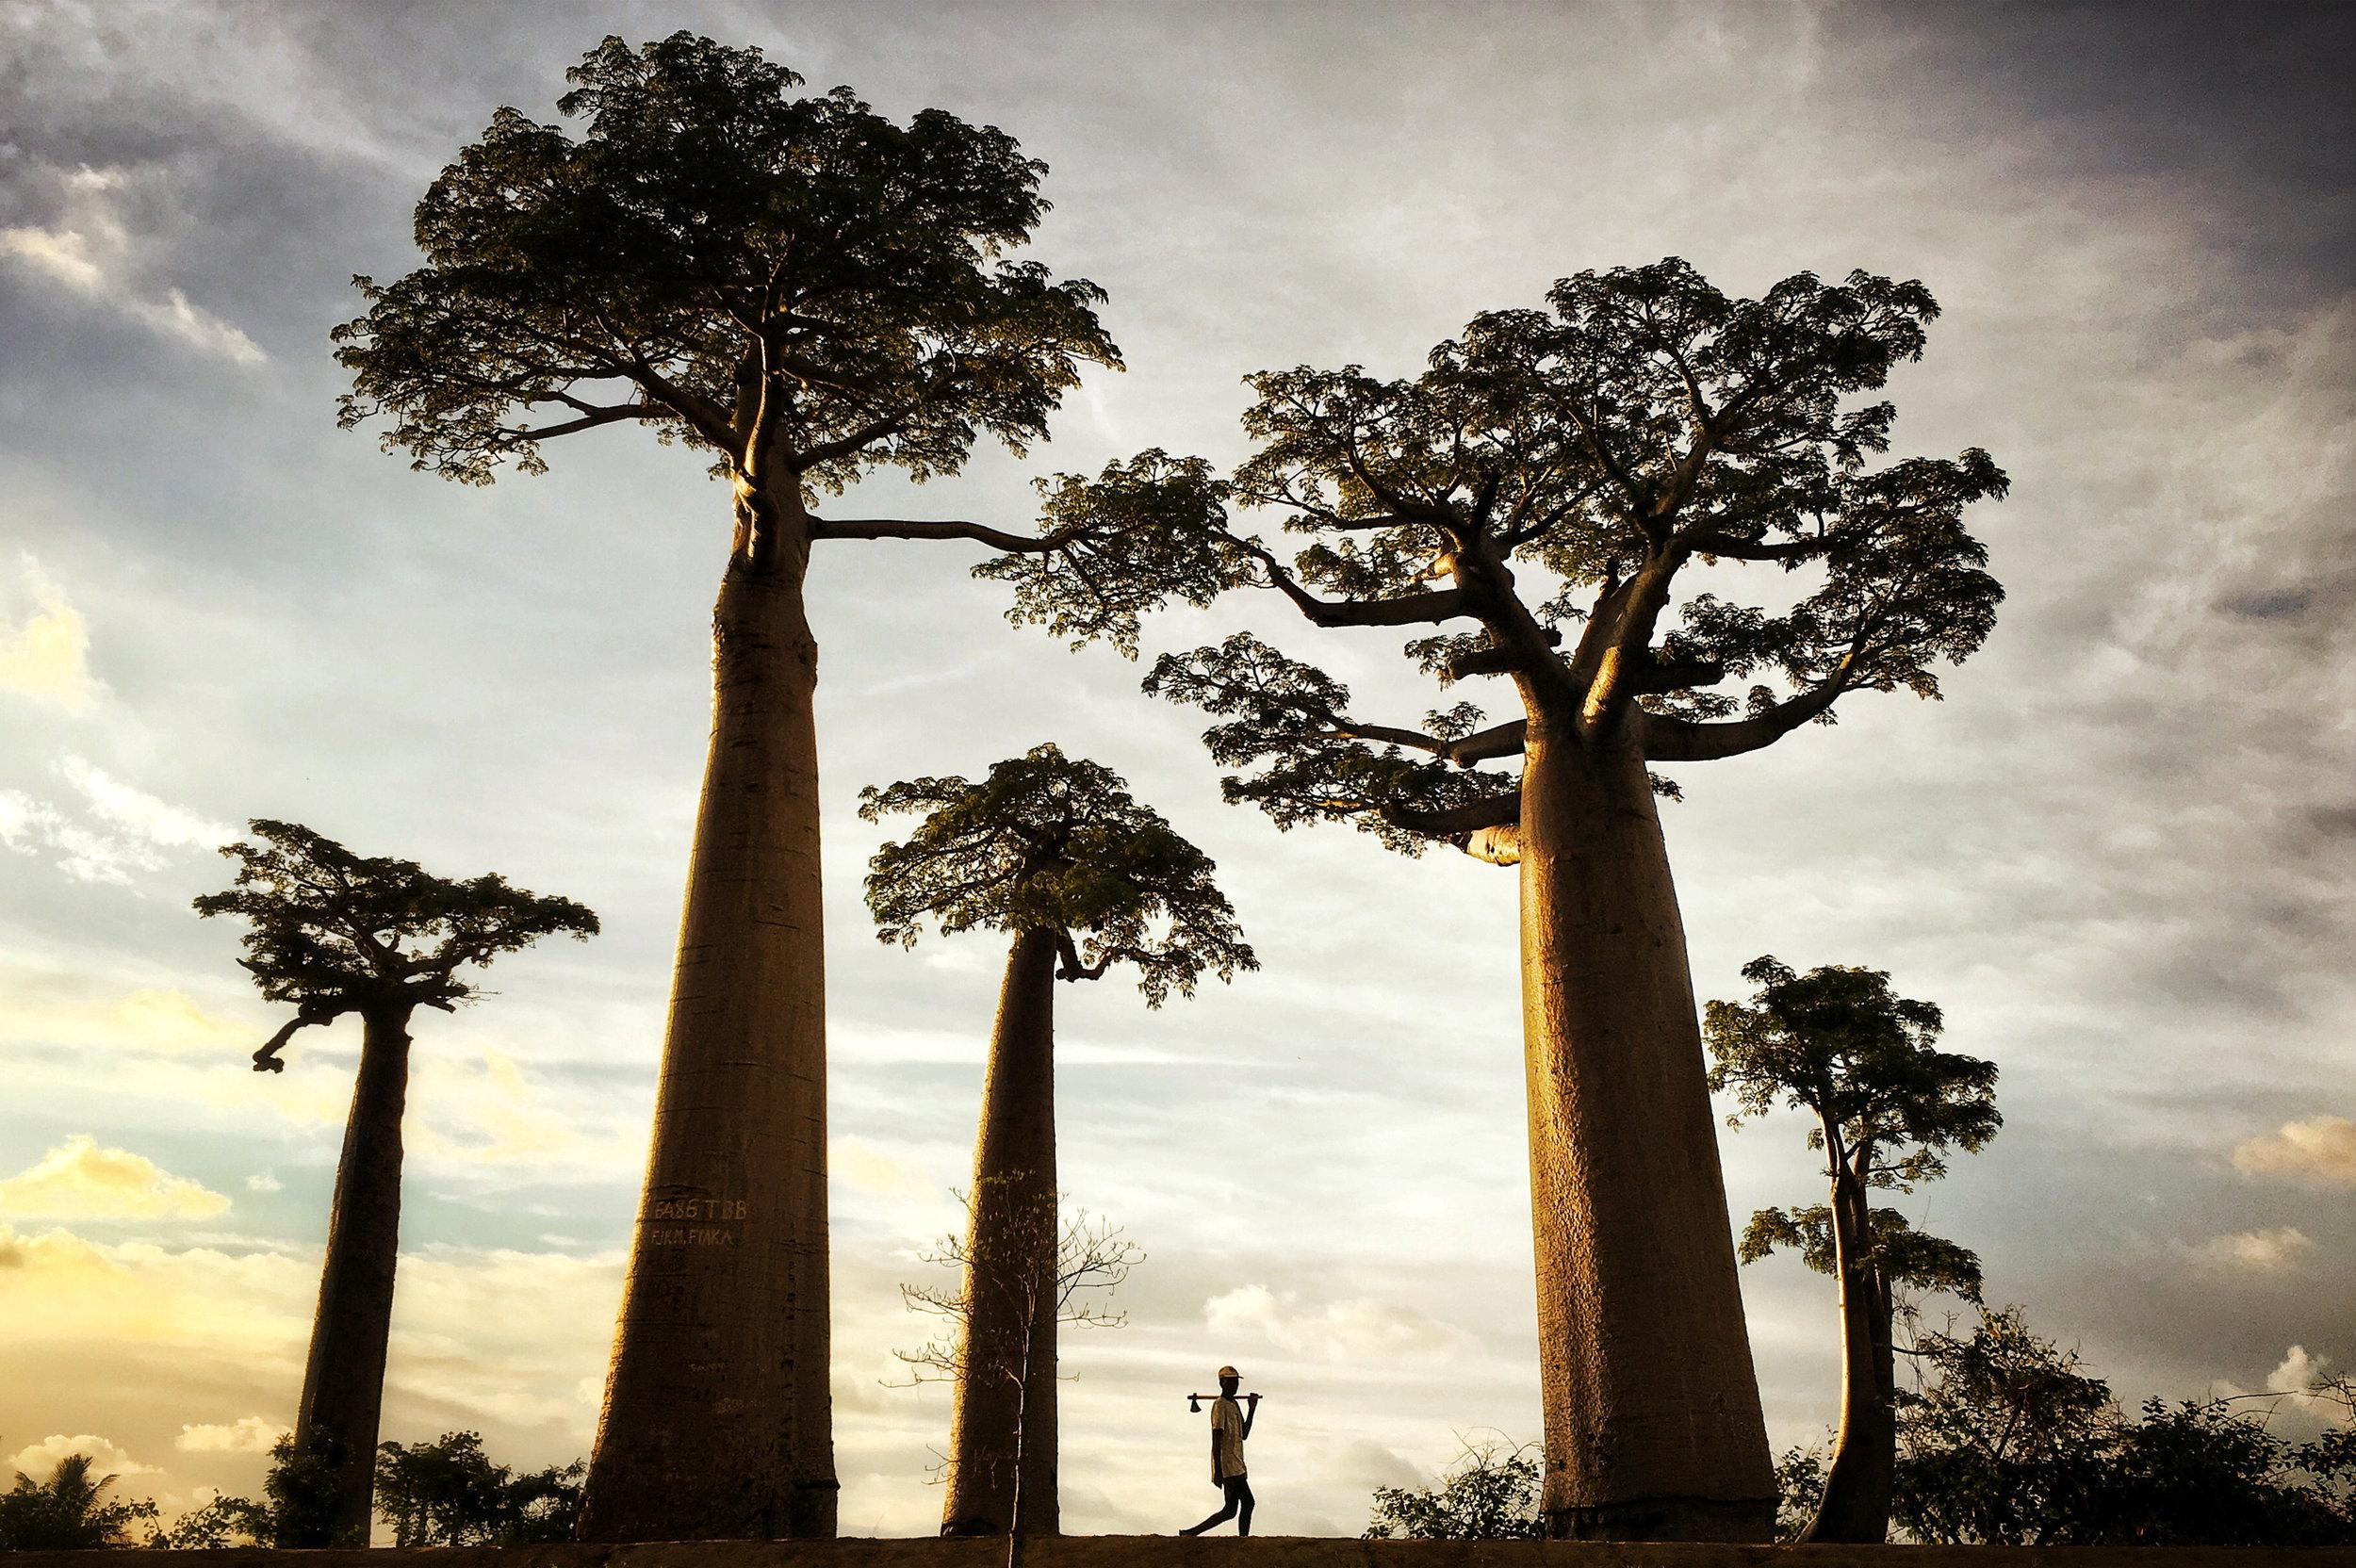 A man walks through the Avenue of the Baobabs at dusk near Morondava, Madagascar